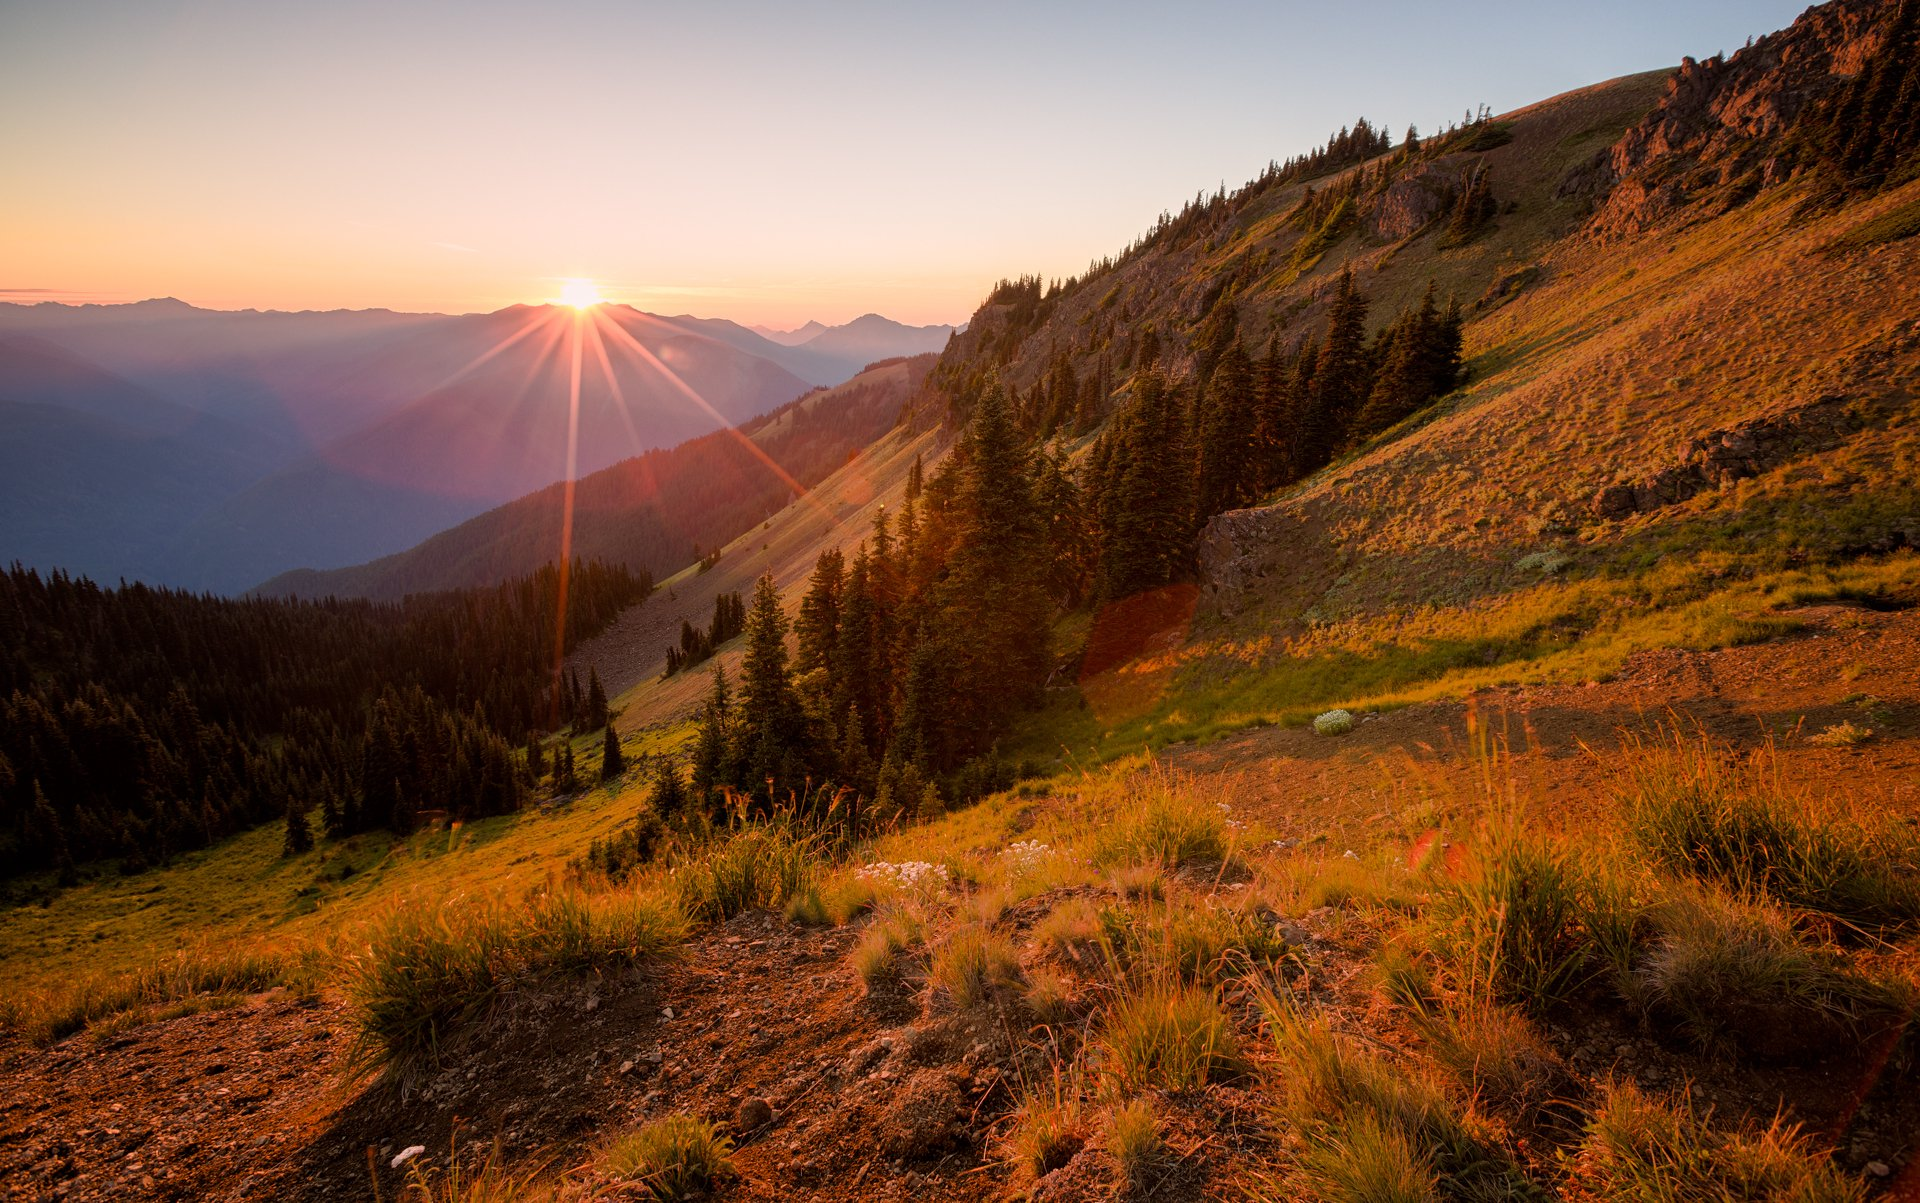 закат склон sunset the slope  № 1569262 бесплатно